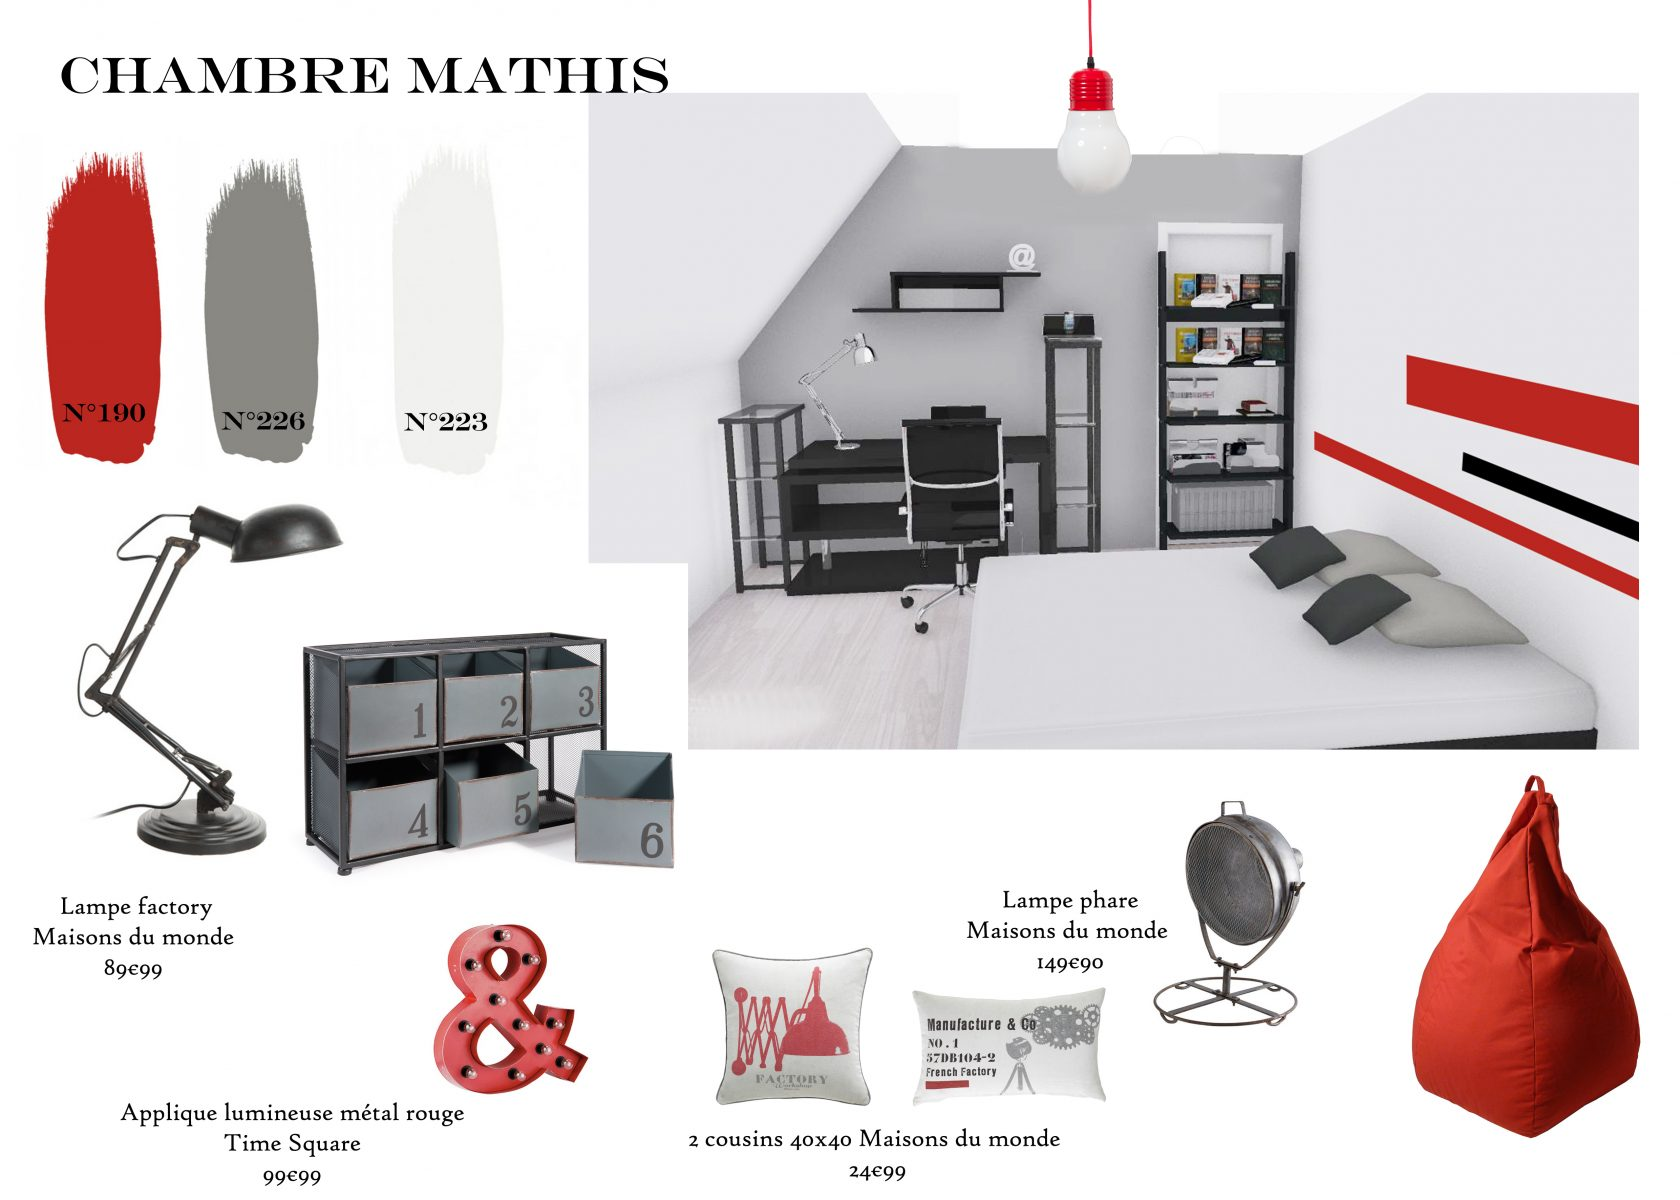 Chambre-Mathis-1 Couleur & Peinture Little Greene